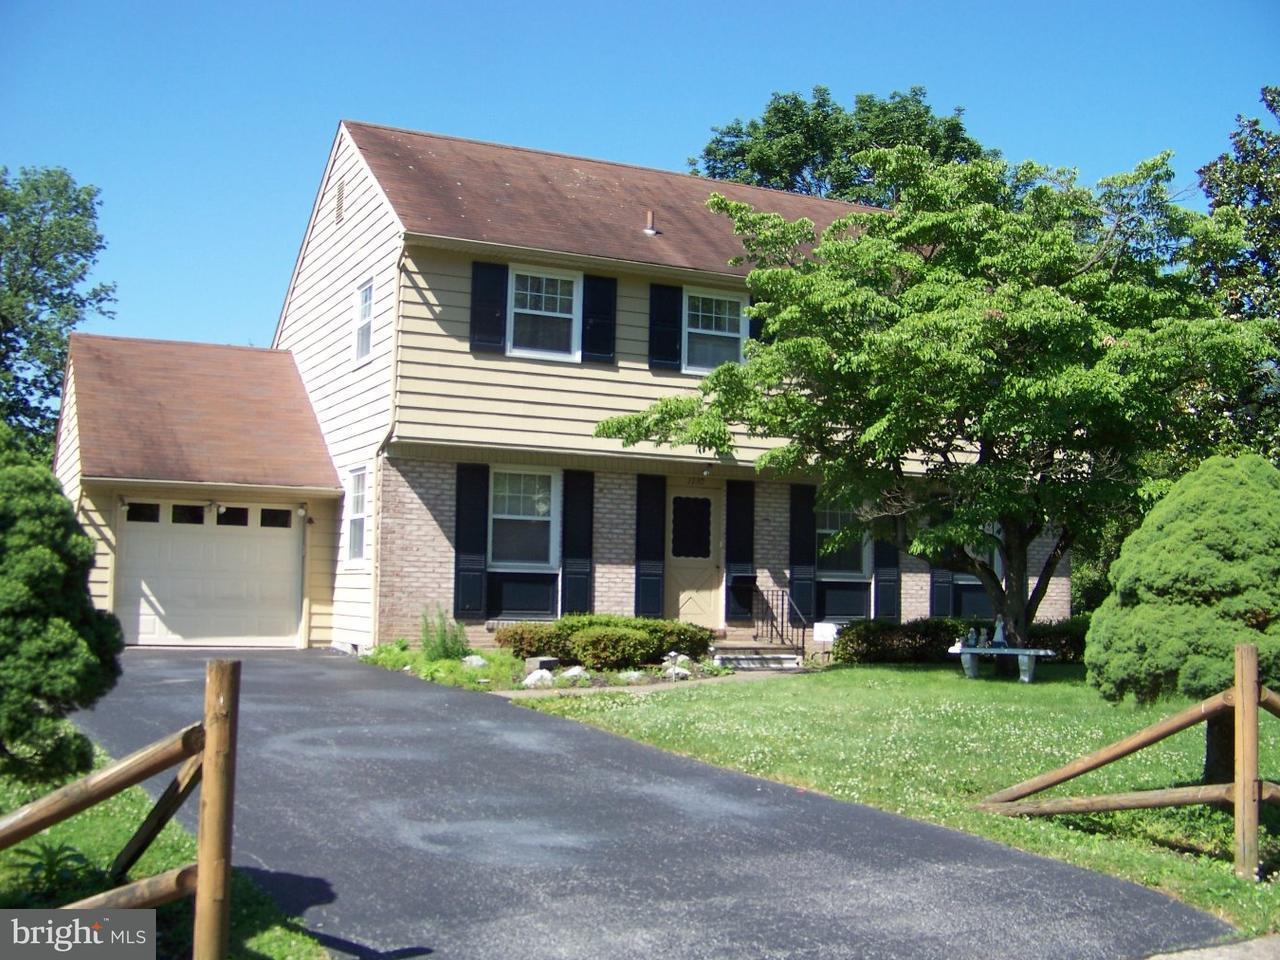 Single Family Home for Sale at 1730 MAGNOLIA Lane Jeffersonville, Pennsylvania 19403 United States